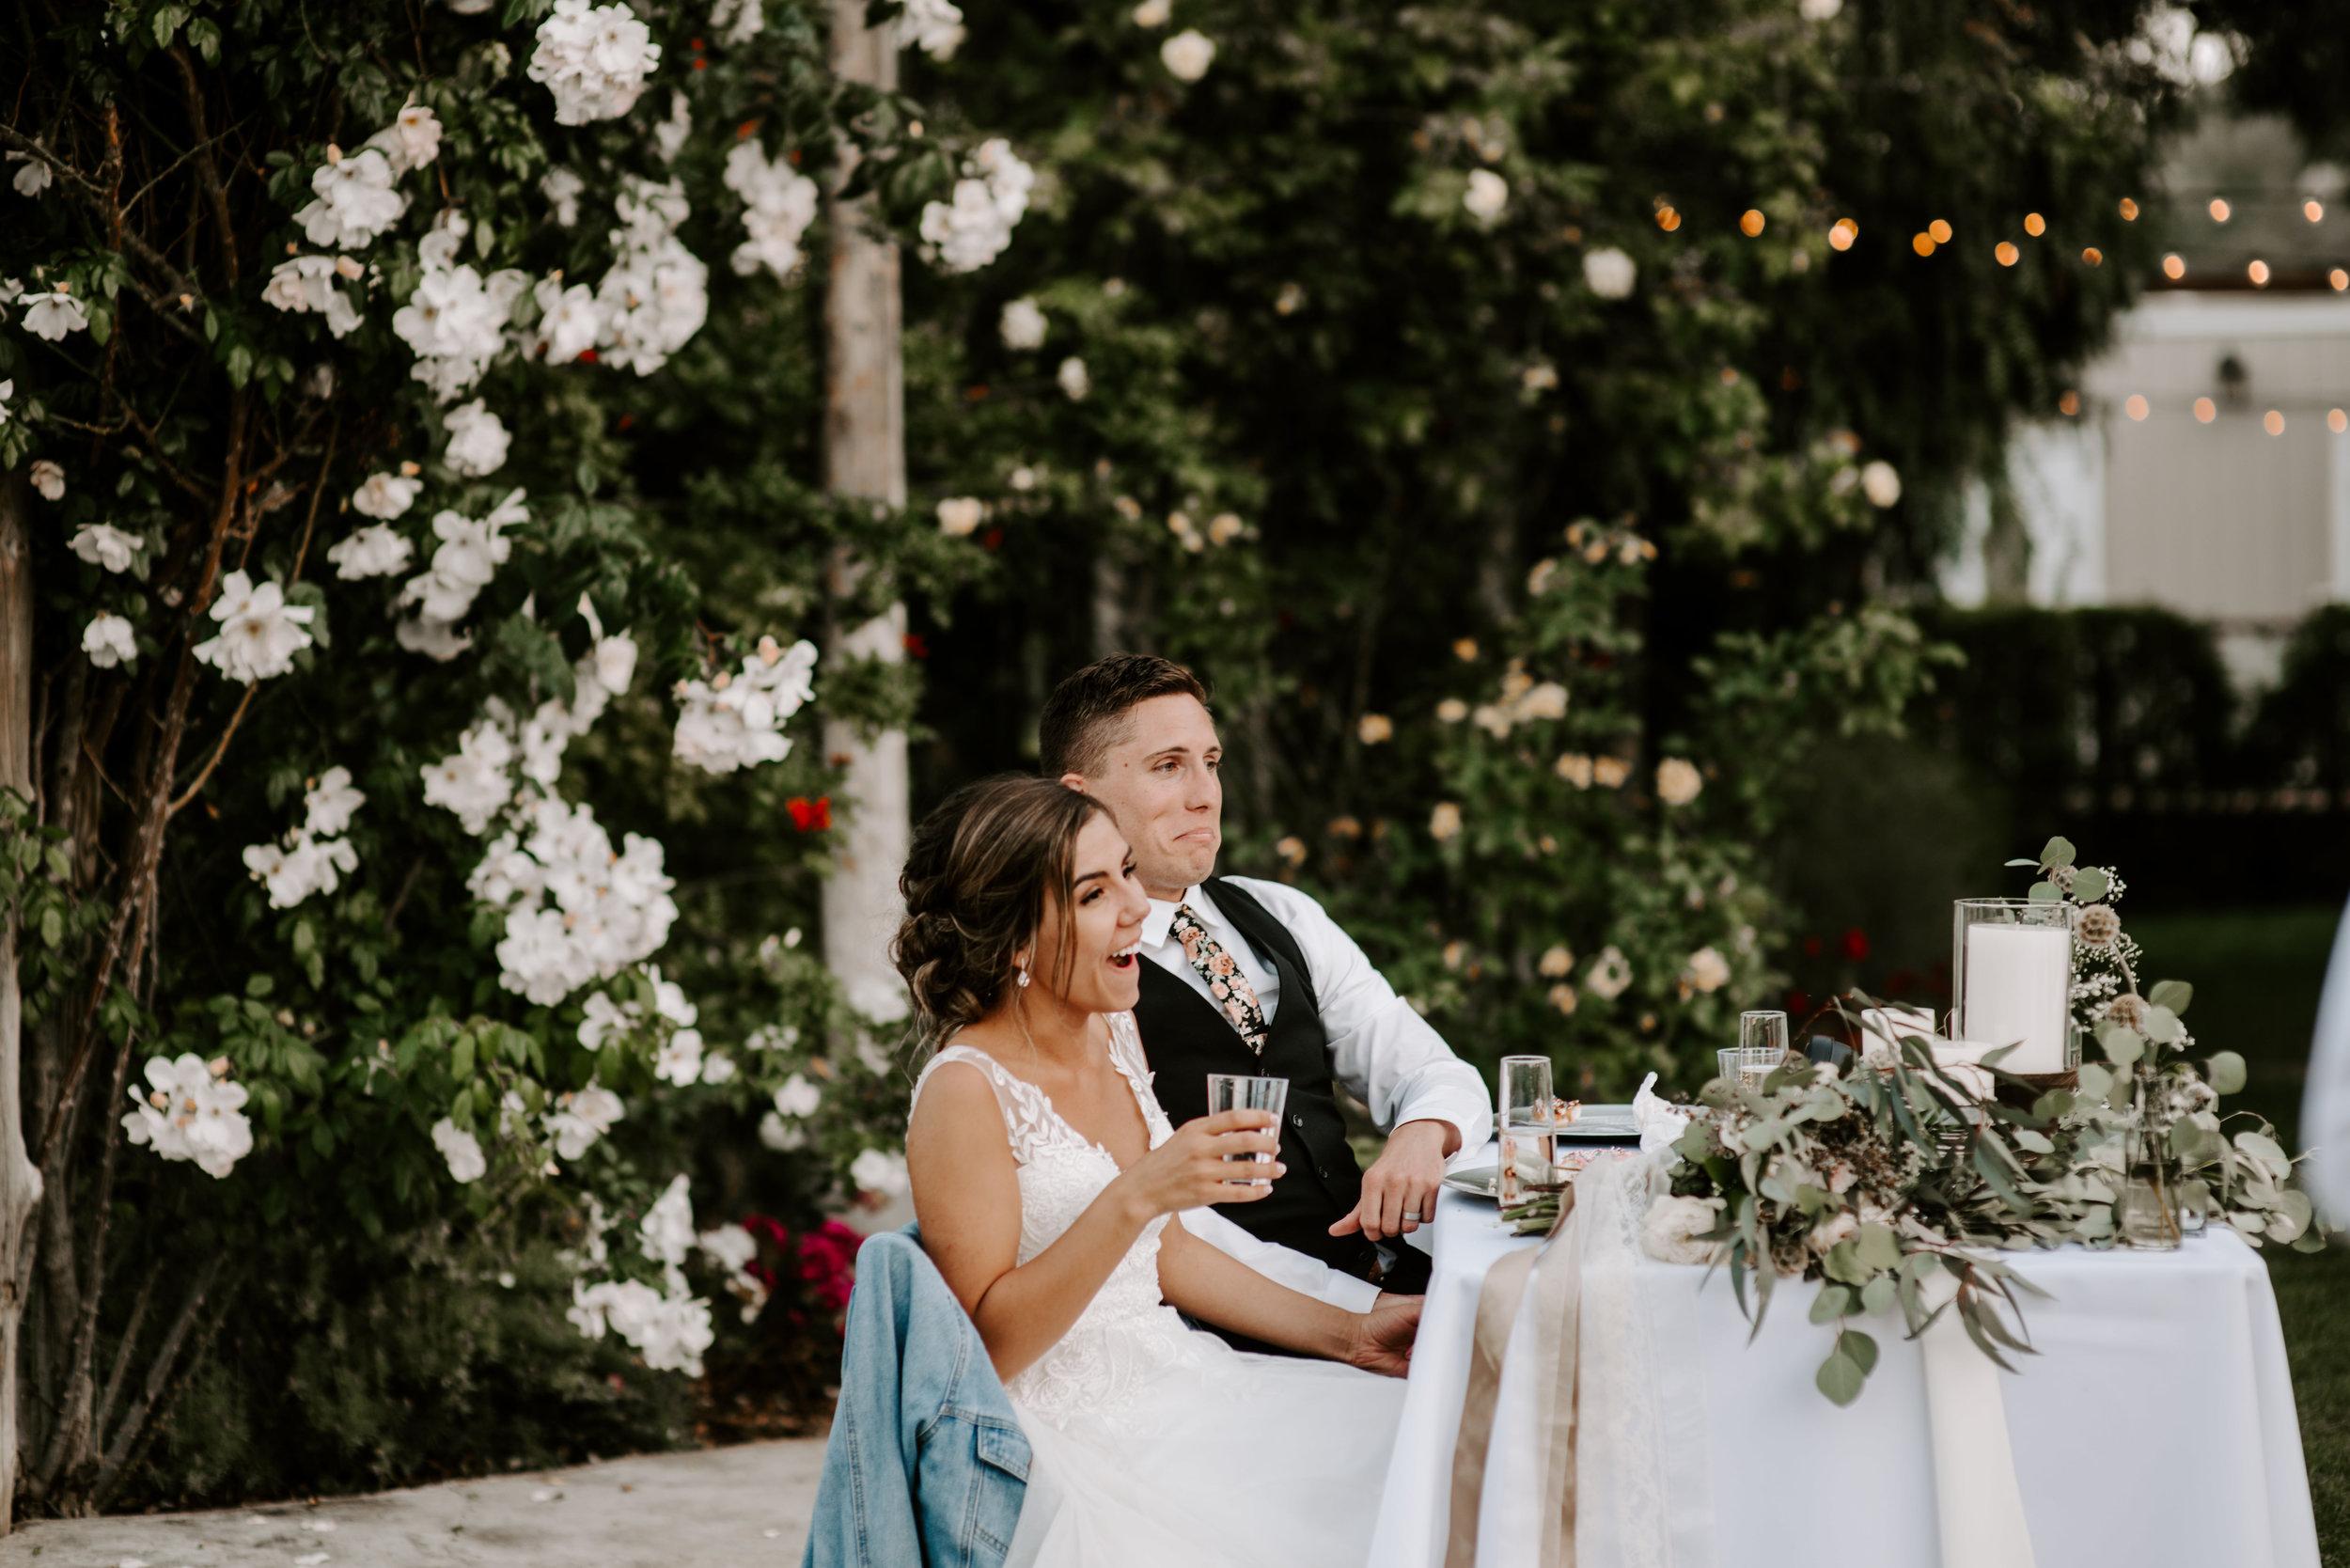 kate+zack_wedding_secludedgardenestate_temecula_madisonrylee_1162.jpg